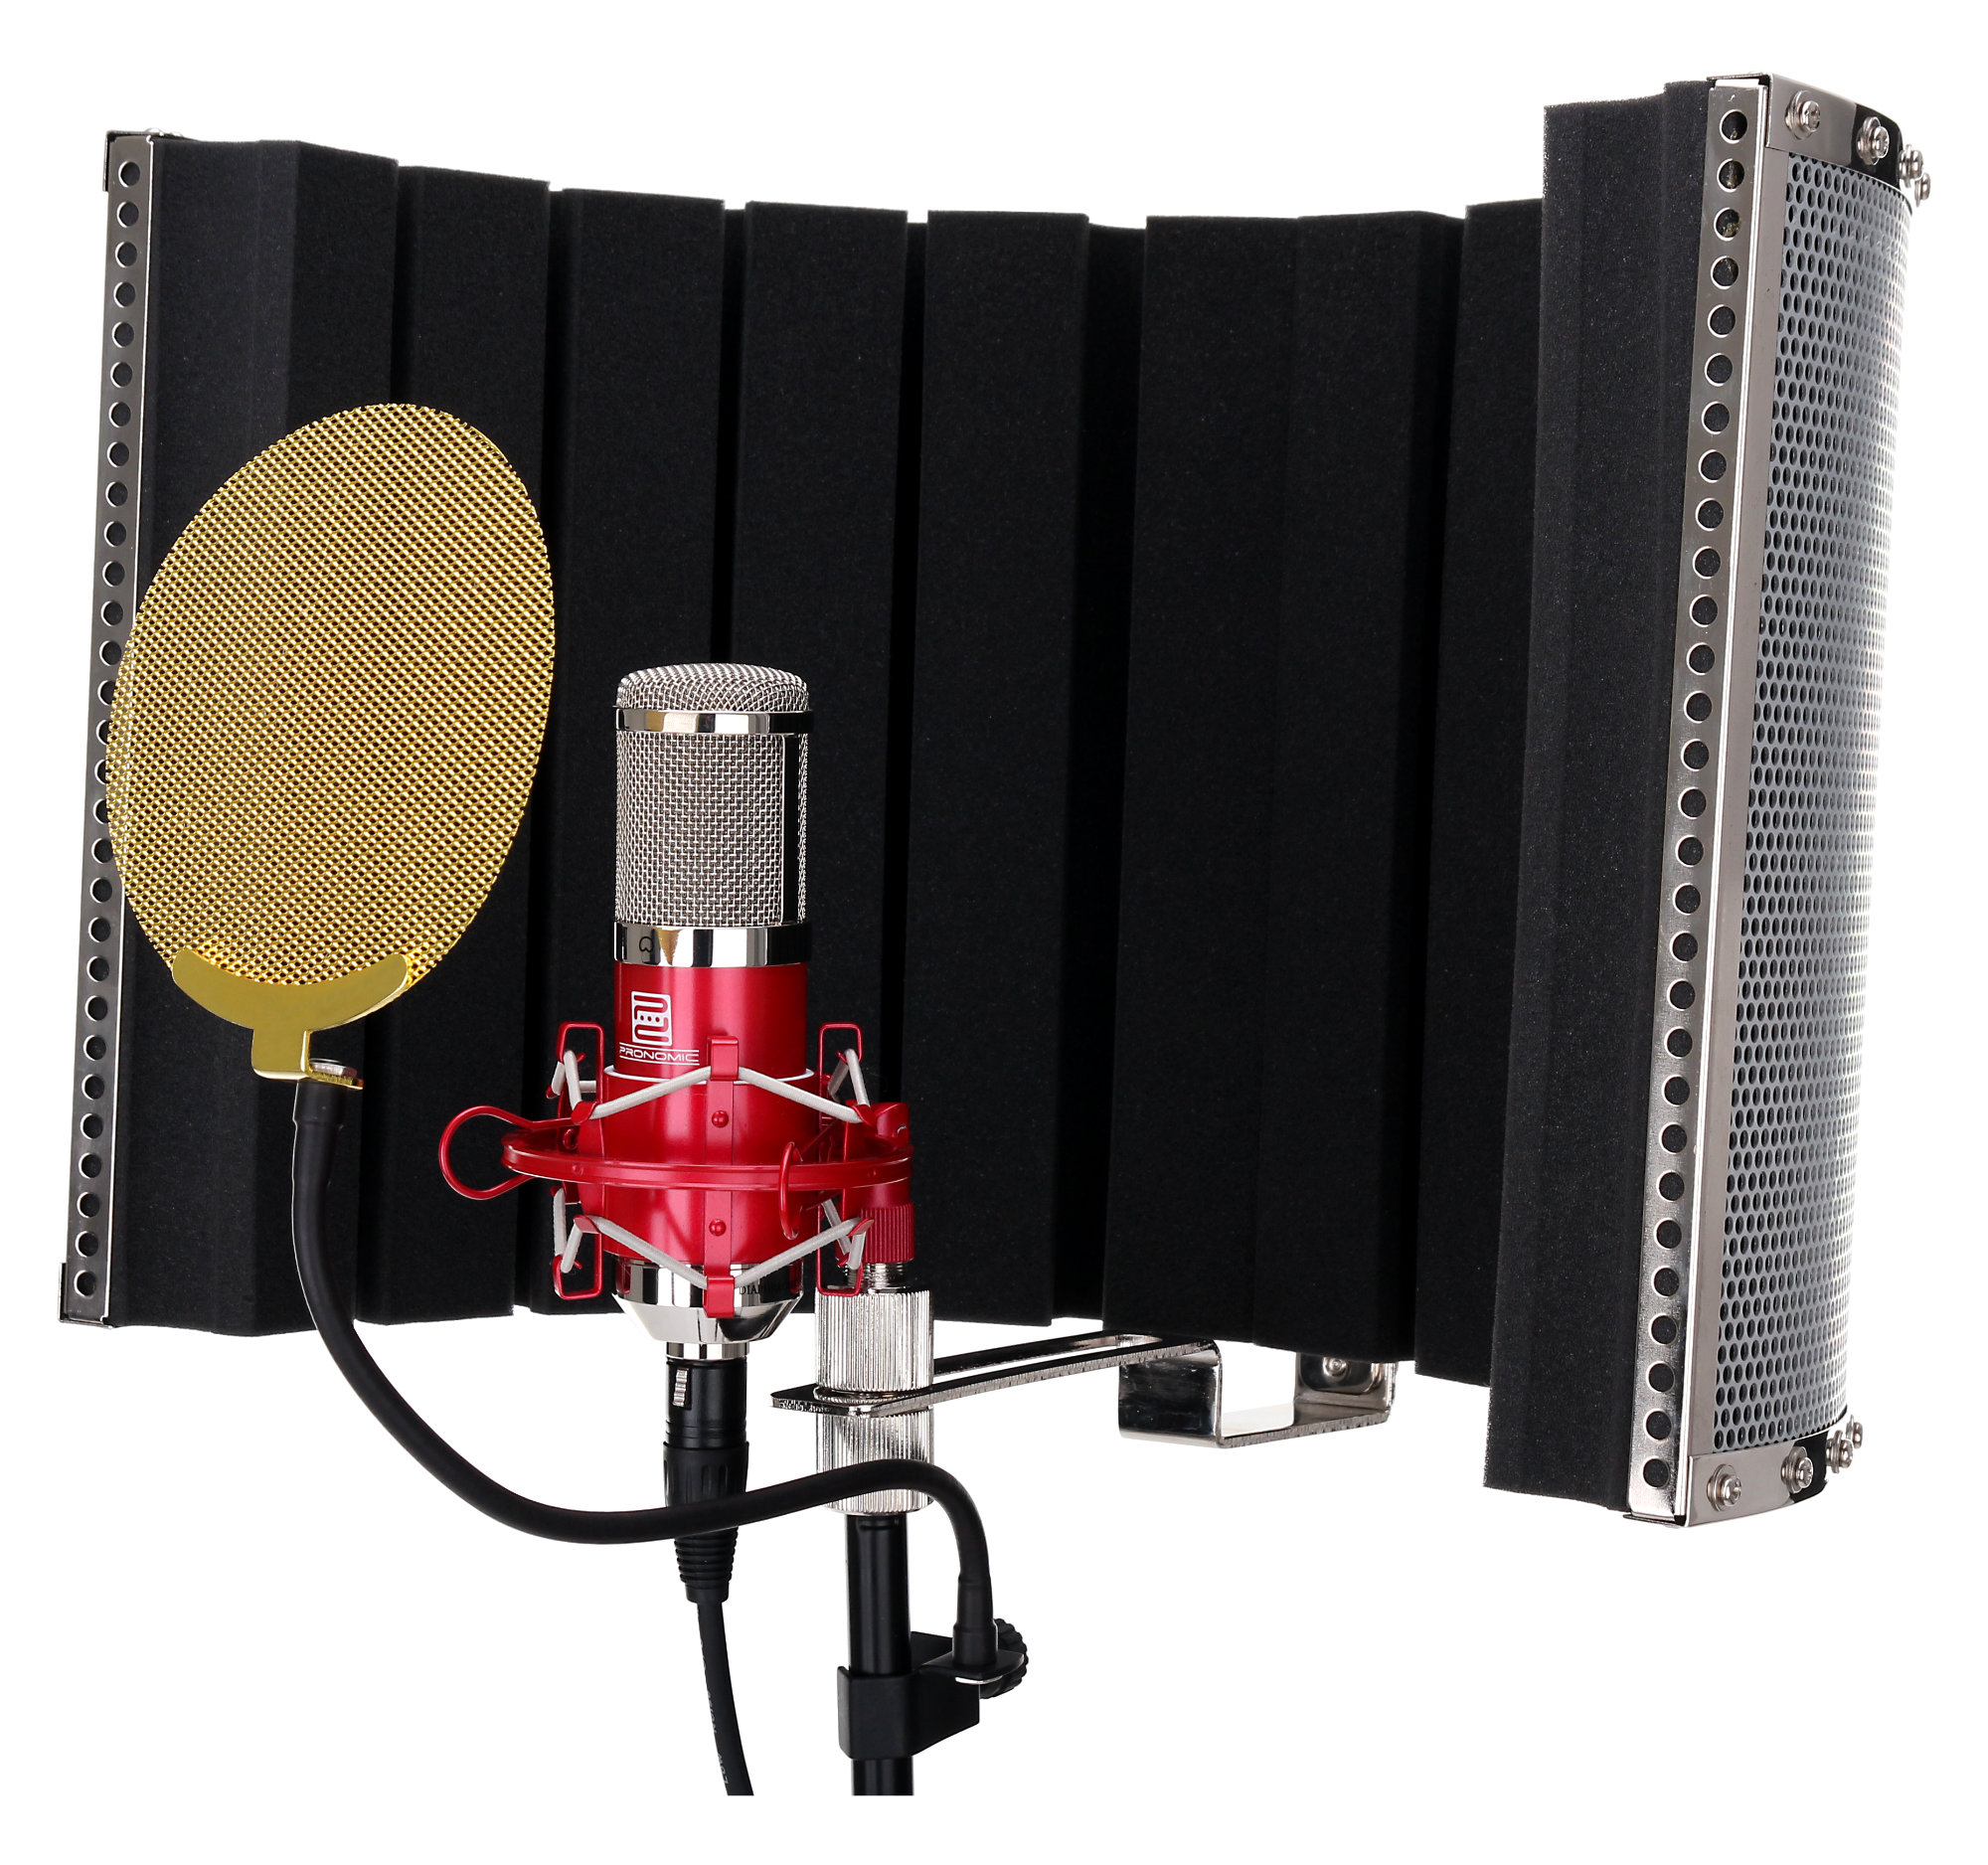 Pronomic Cm 100r Large Membrane Microphone Set Incl Stand